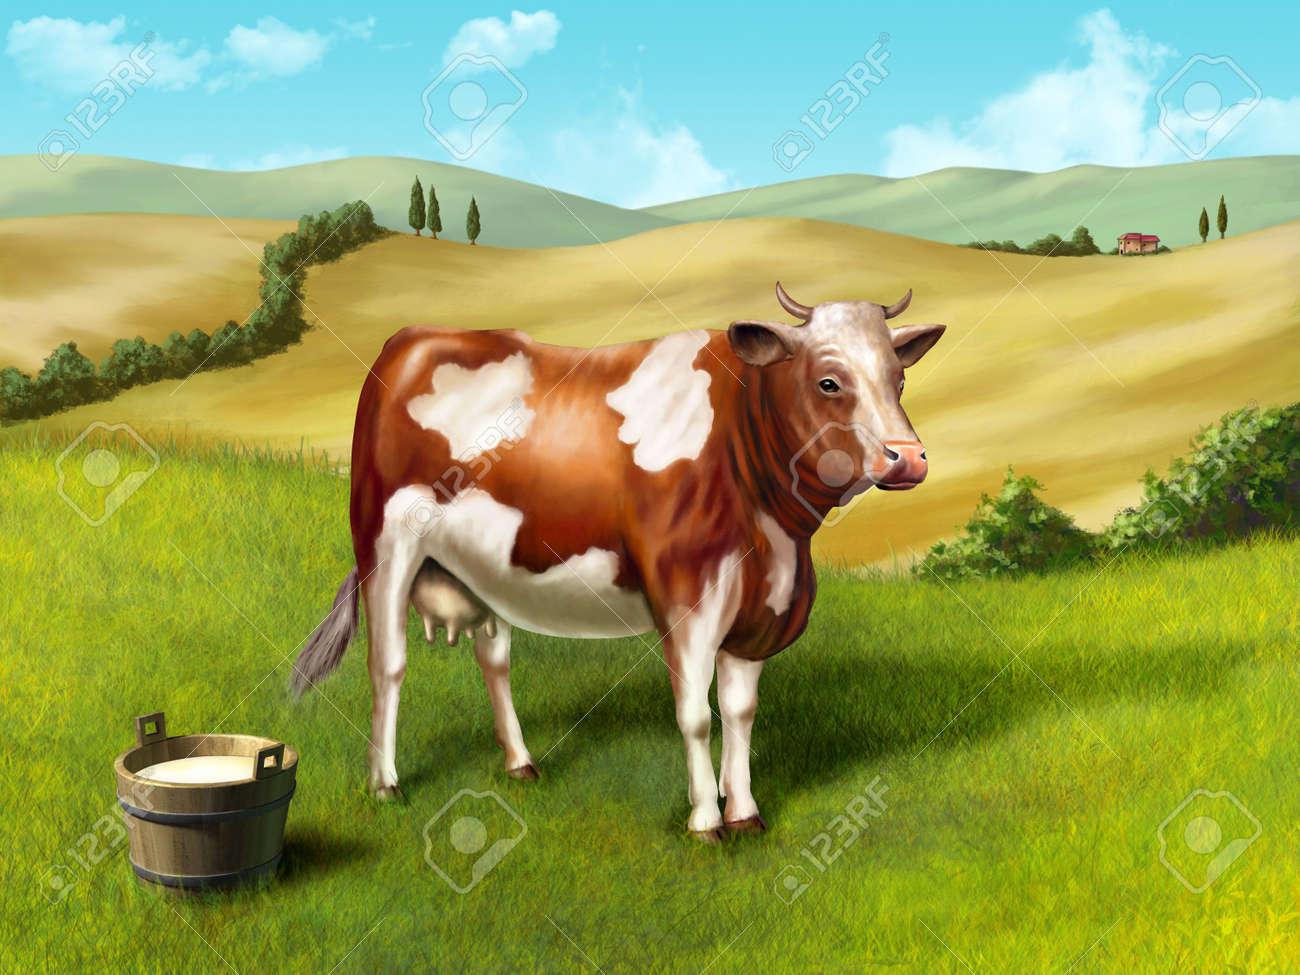 Cow and milk bucket in a rural landscape. Original digital illustration. Stock Photo - 6818899